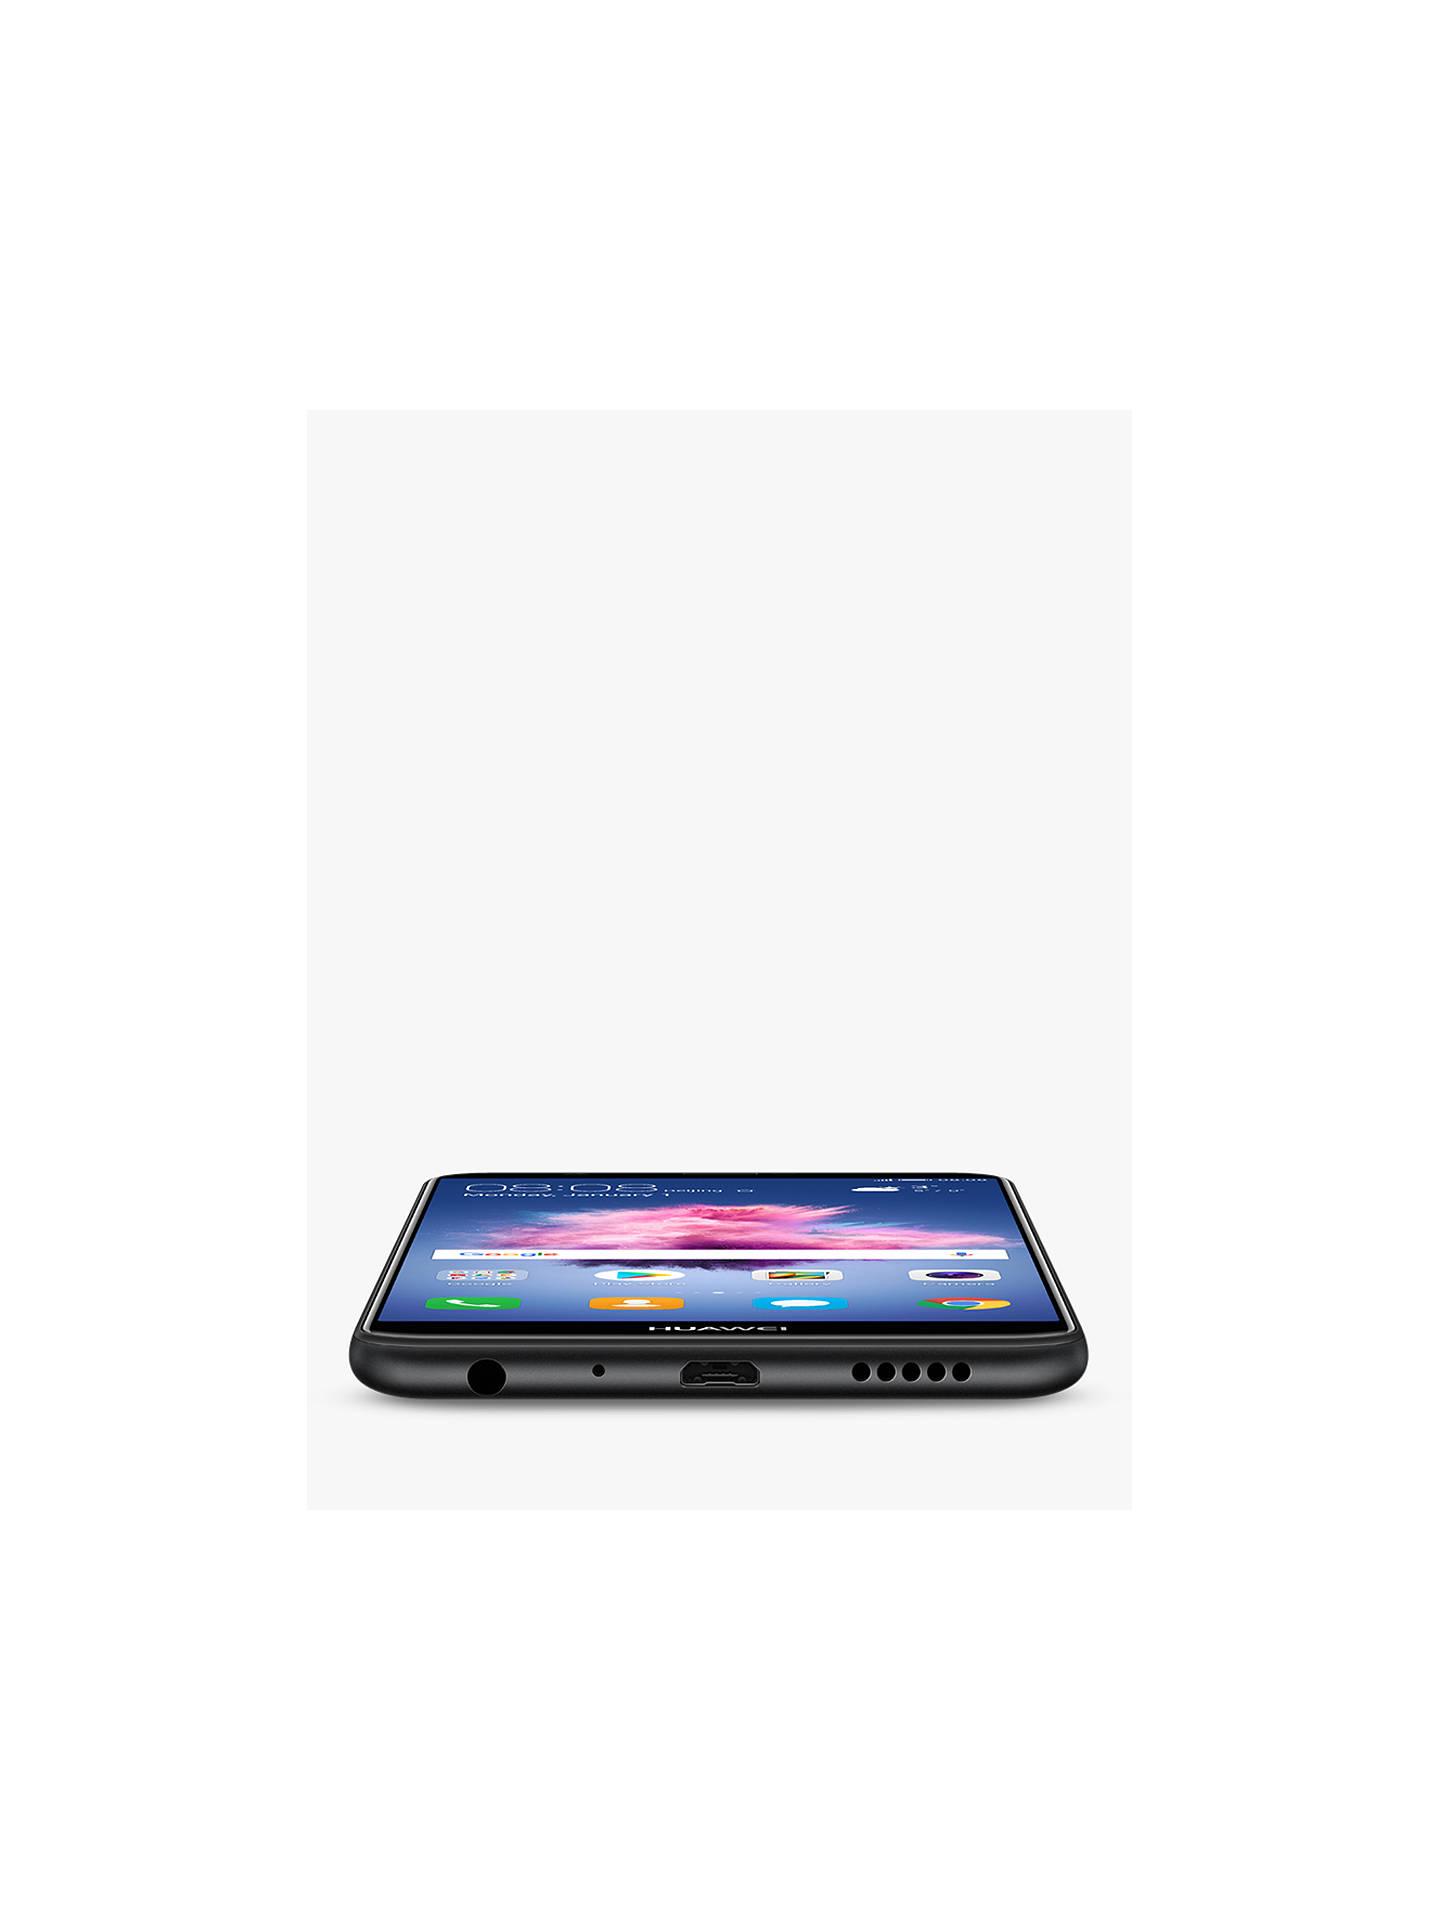 "Huawei P Smart Smartphone, Android, 5 65"", 4G LTE, SIM Free, 32GB, Black"